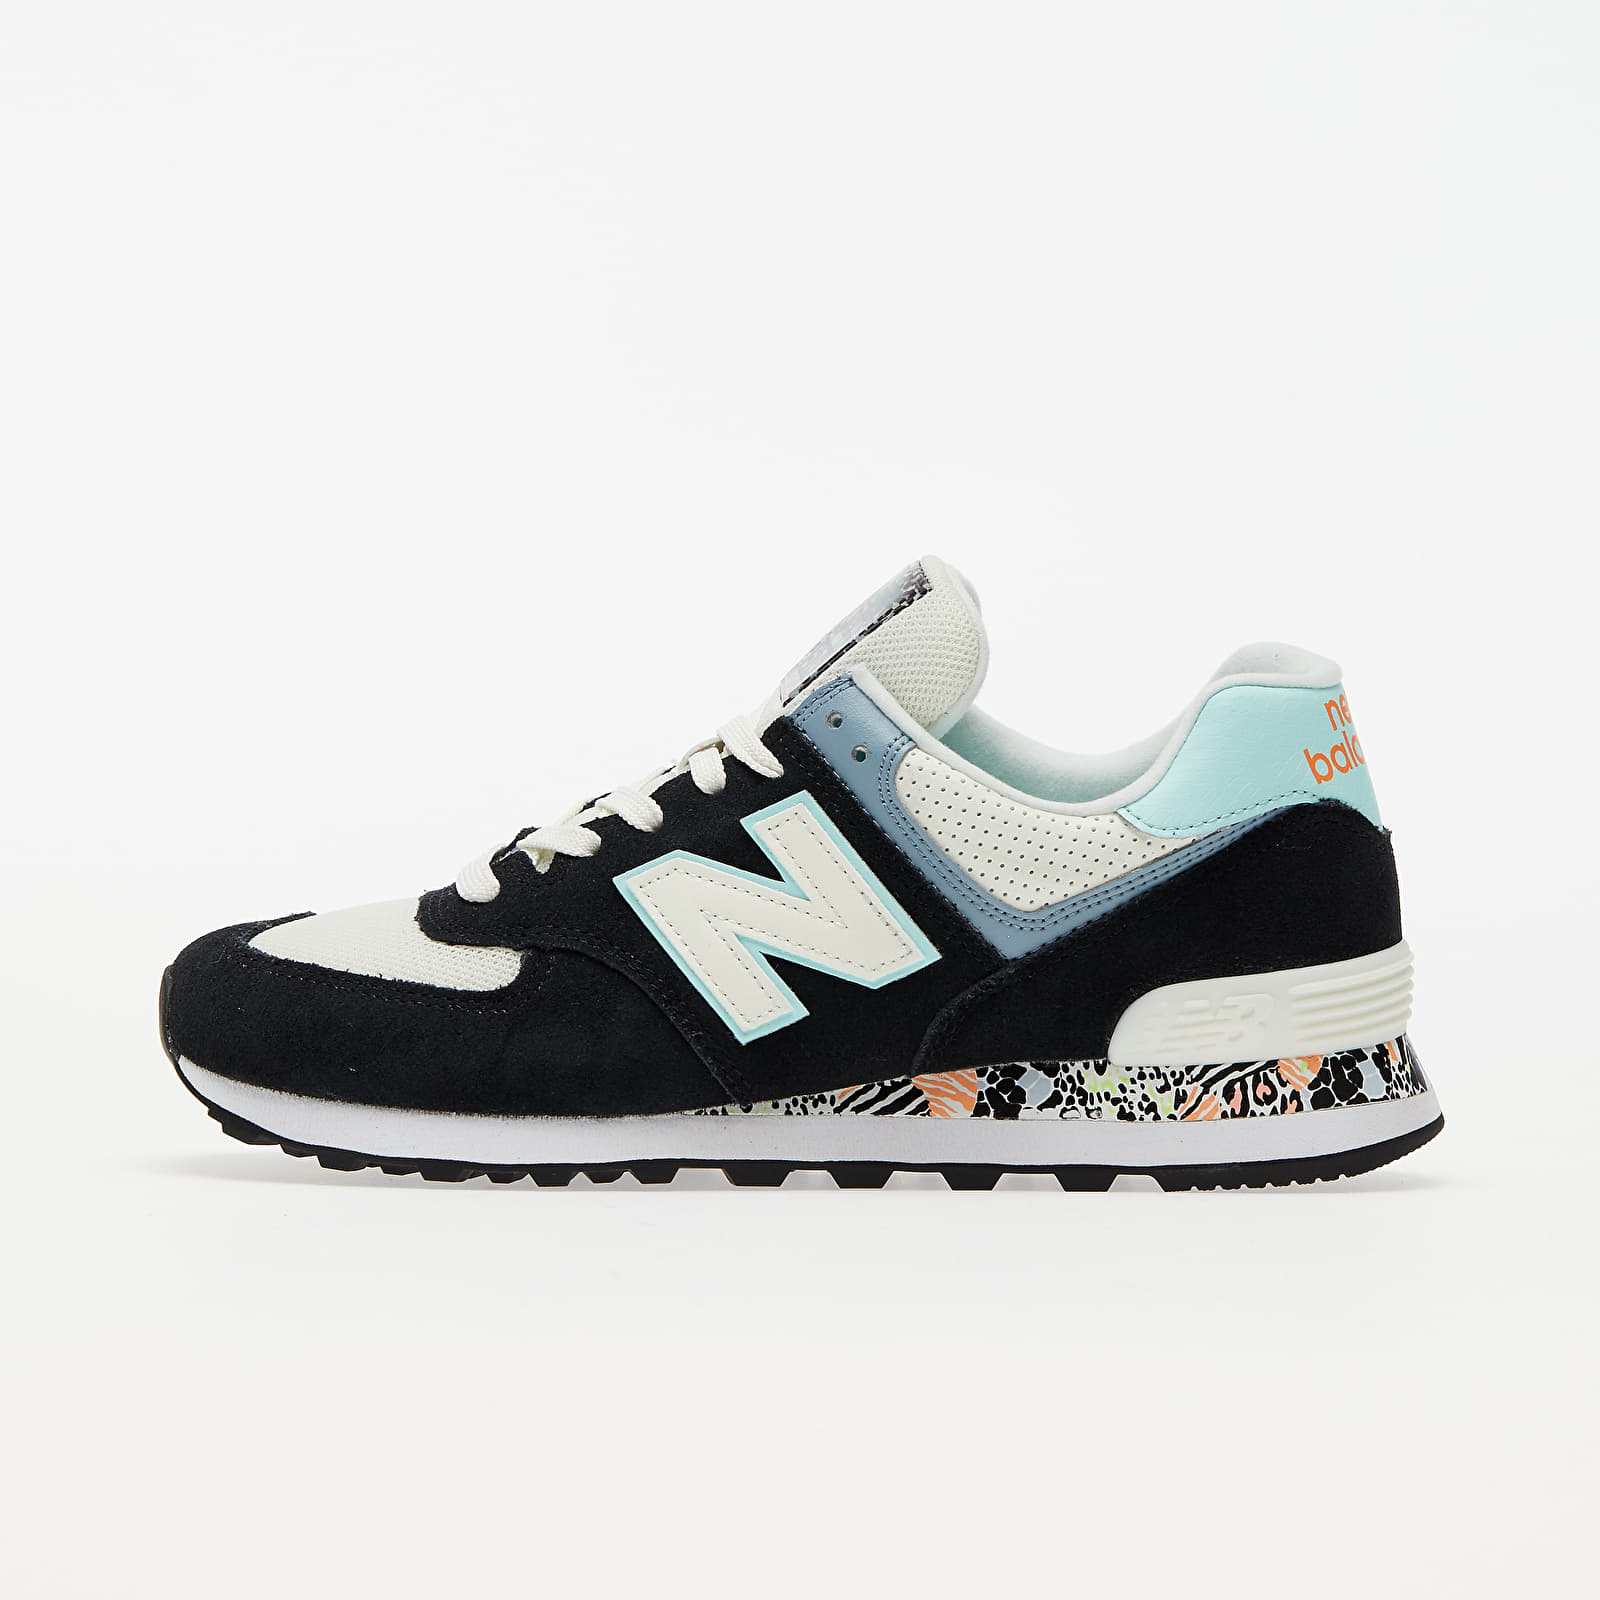 New Balance 574 Black/ Blue/ White EUR 36.5